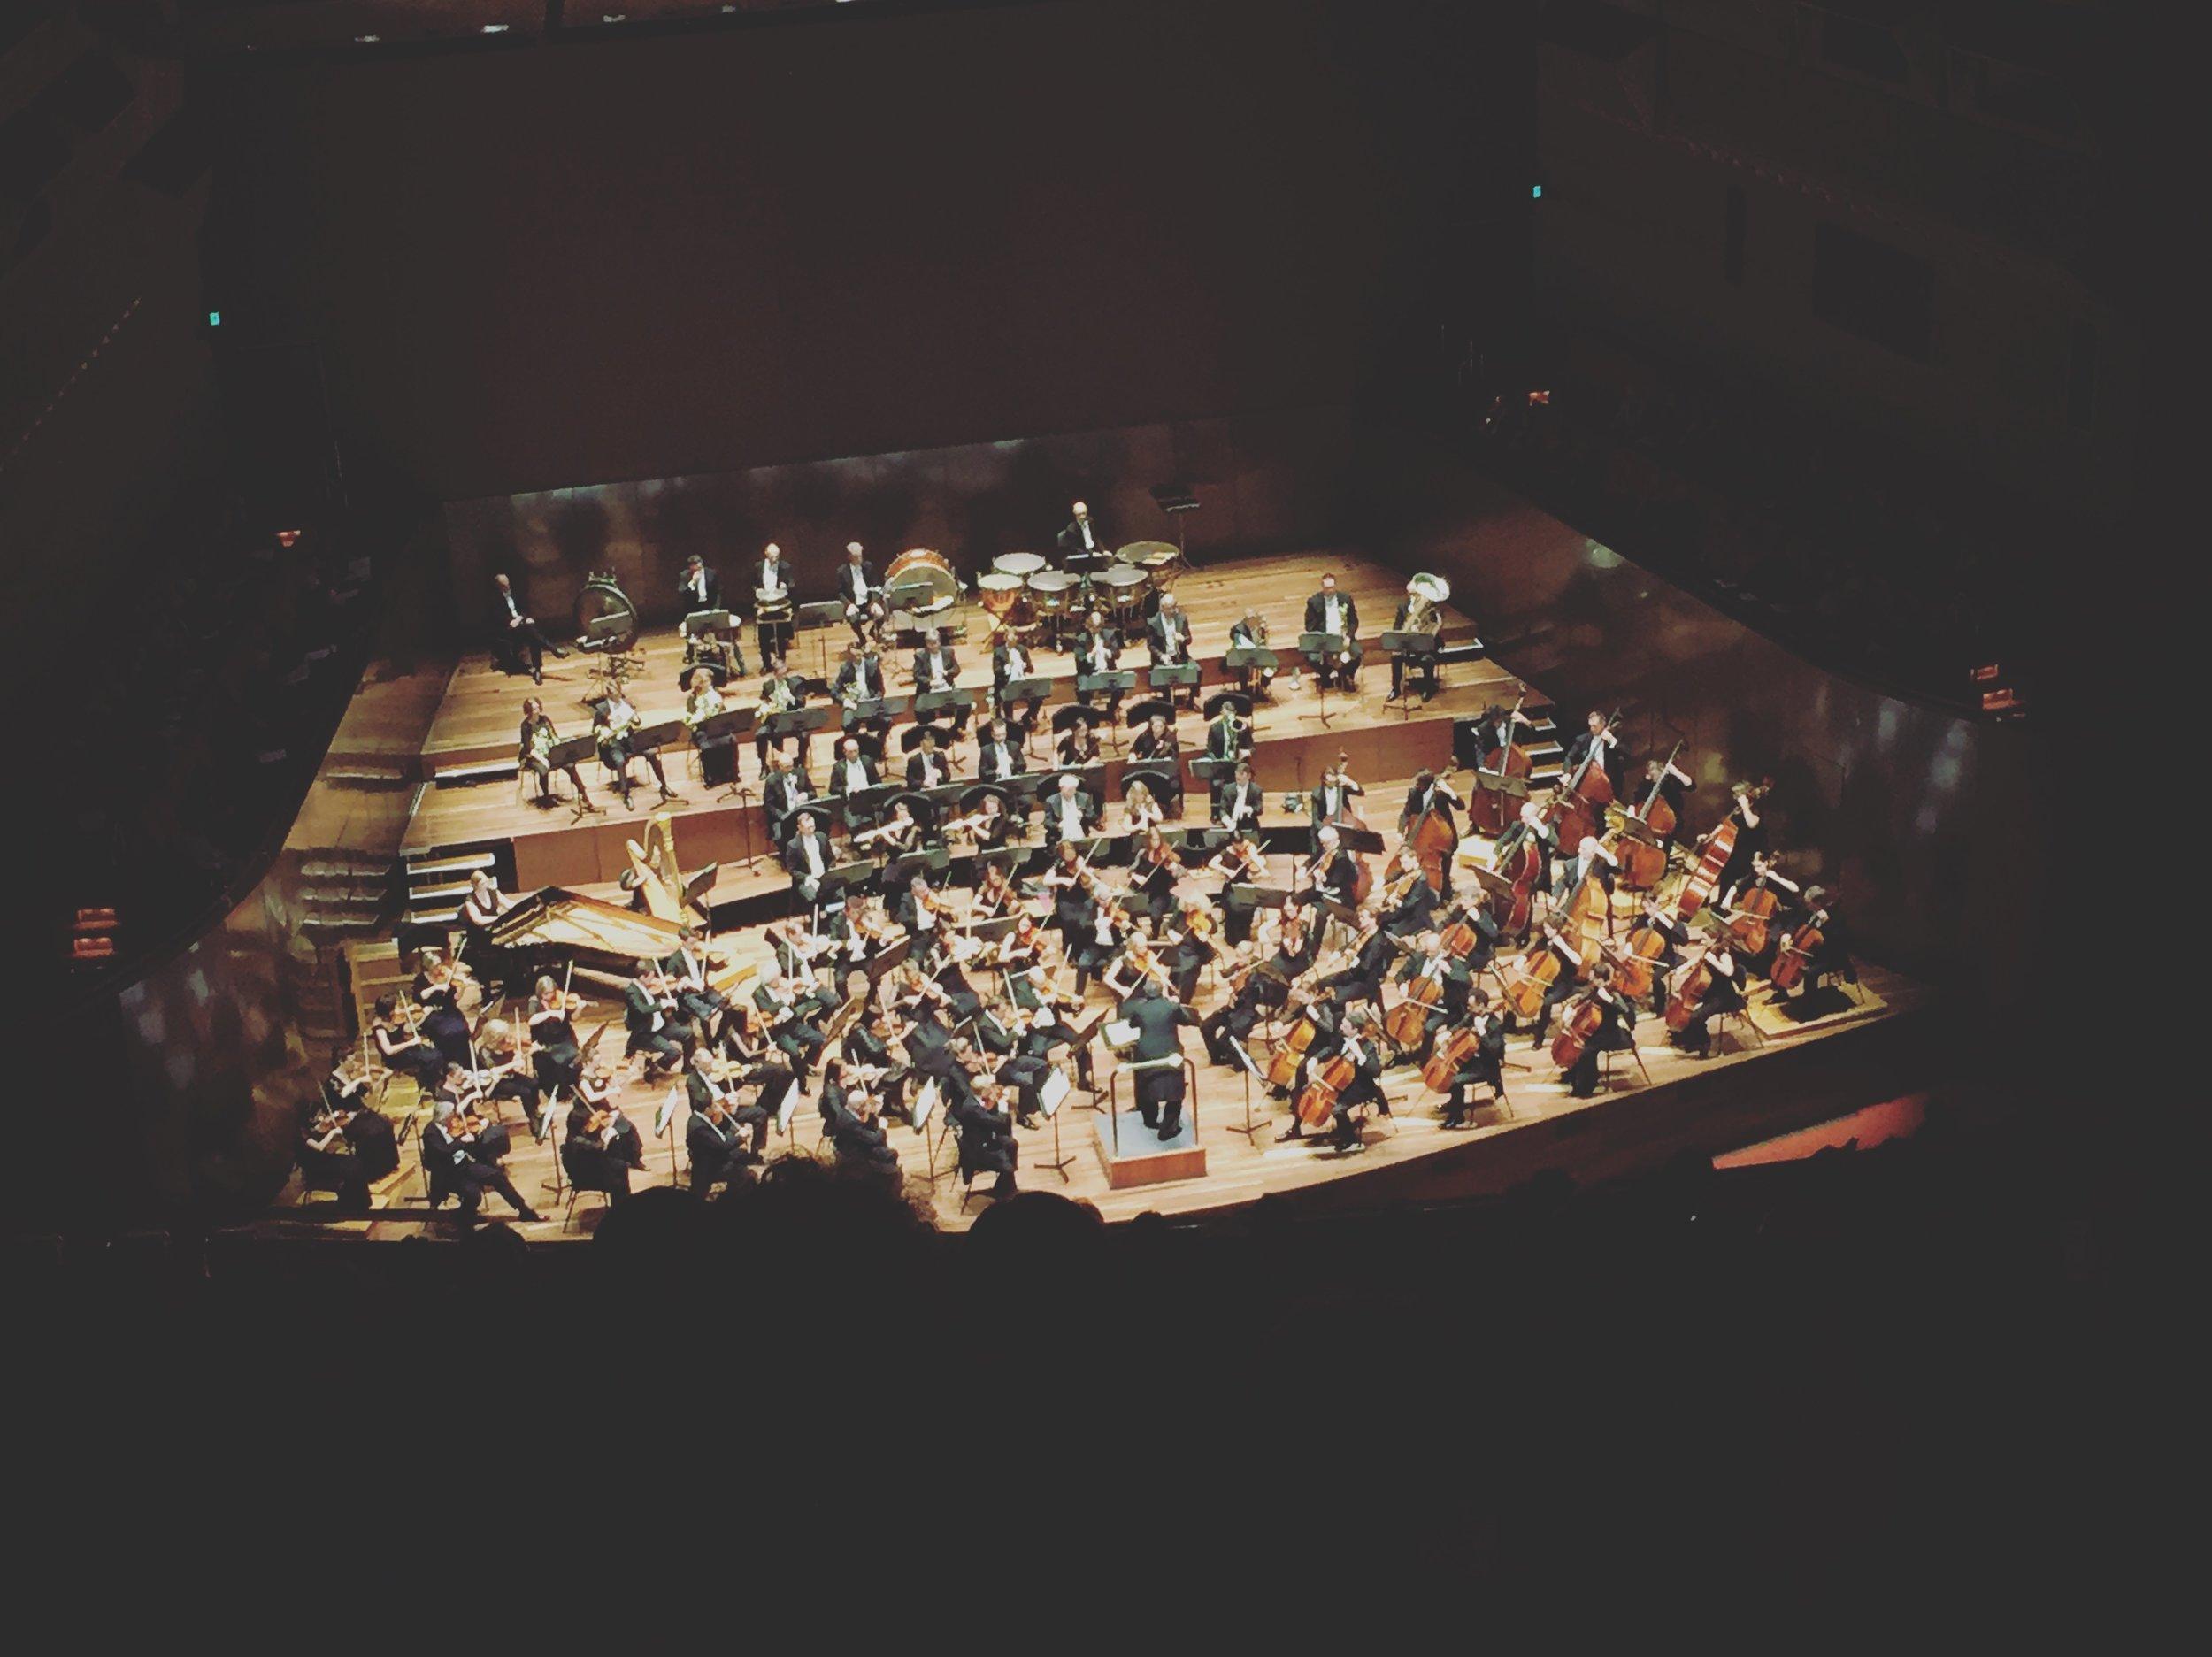 Melbourne Symphony Orchestra performs  Dvorak's Cello Concerto , with German Cellist  Alban Gerhardt, Hamer Hall, Melbourne, AU. Image: © Jasen Scott, 2016.